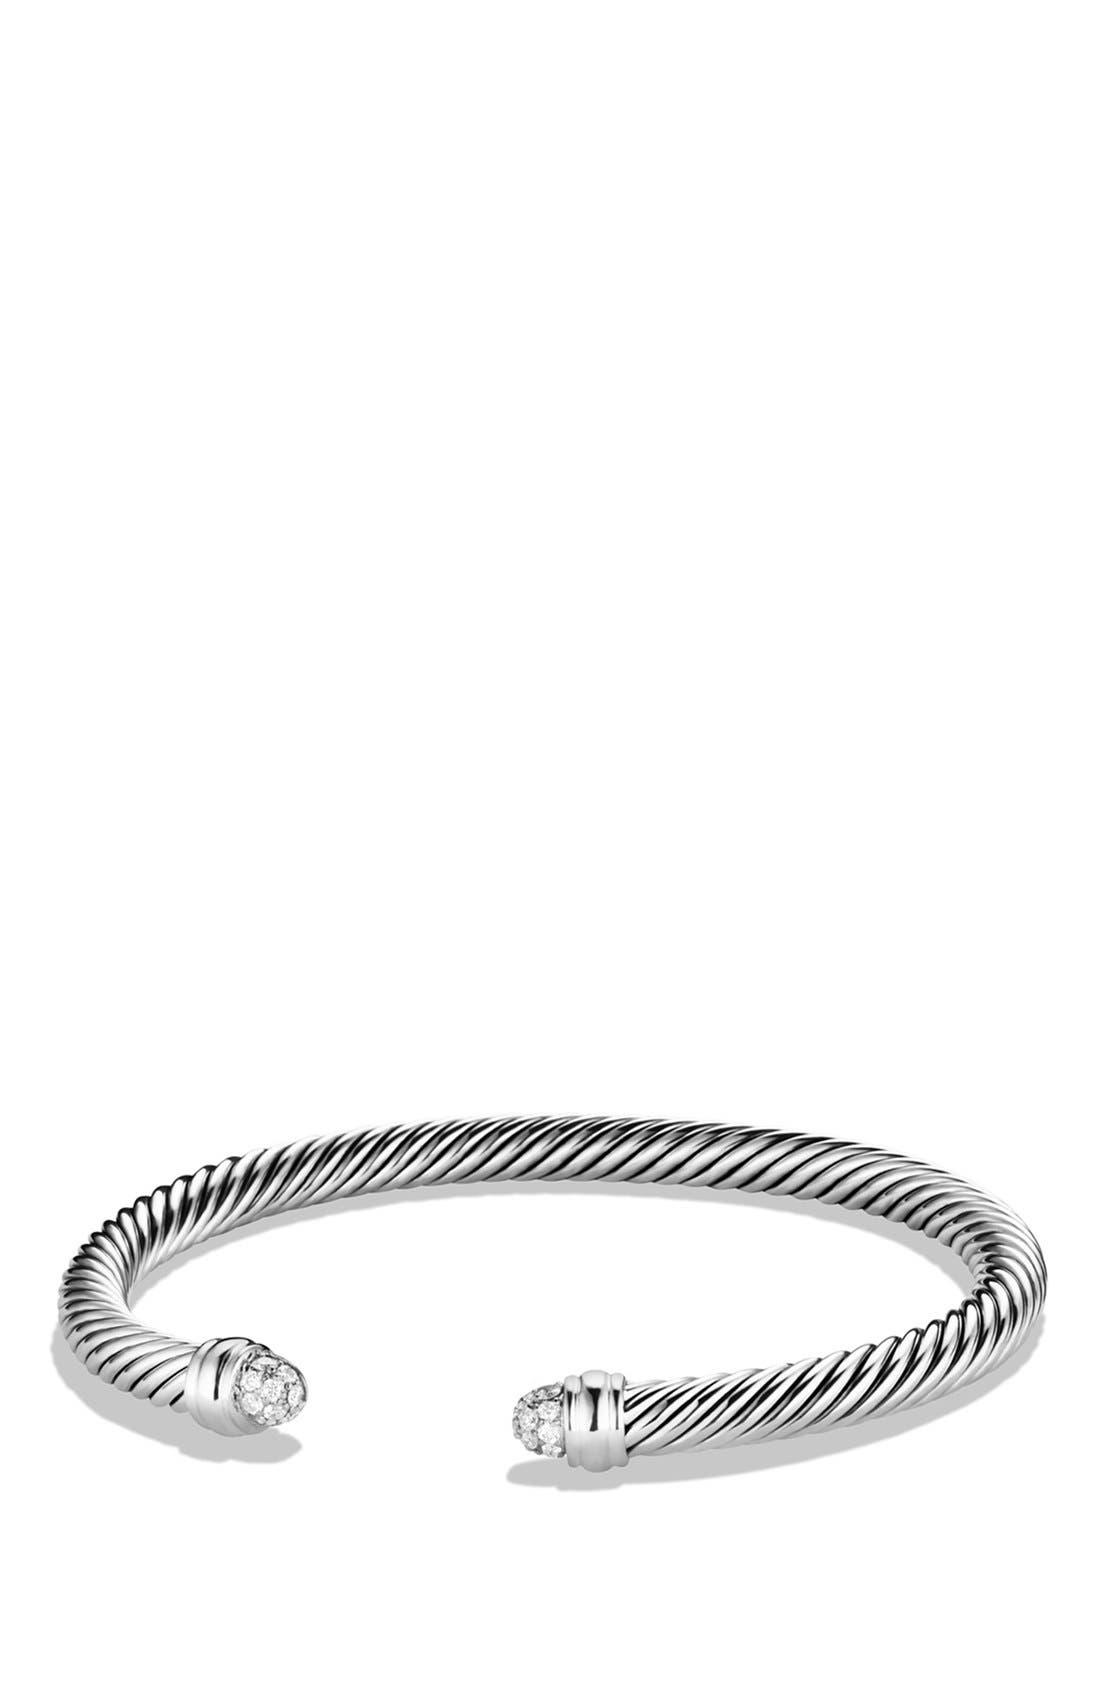 Main Image - David Yurman 'Cable Classics' Bracelet with Diamonds